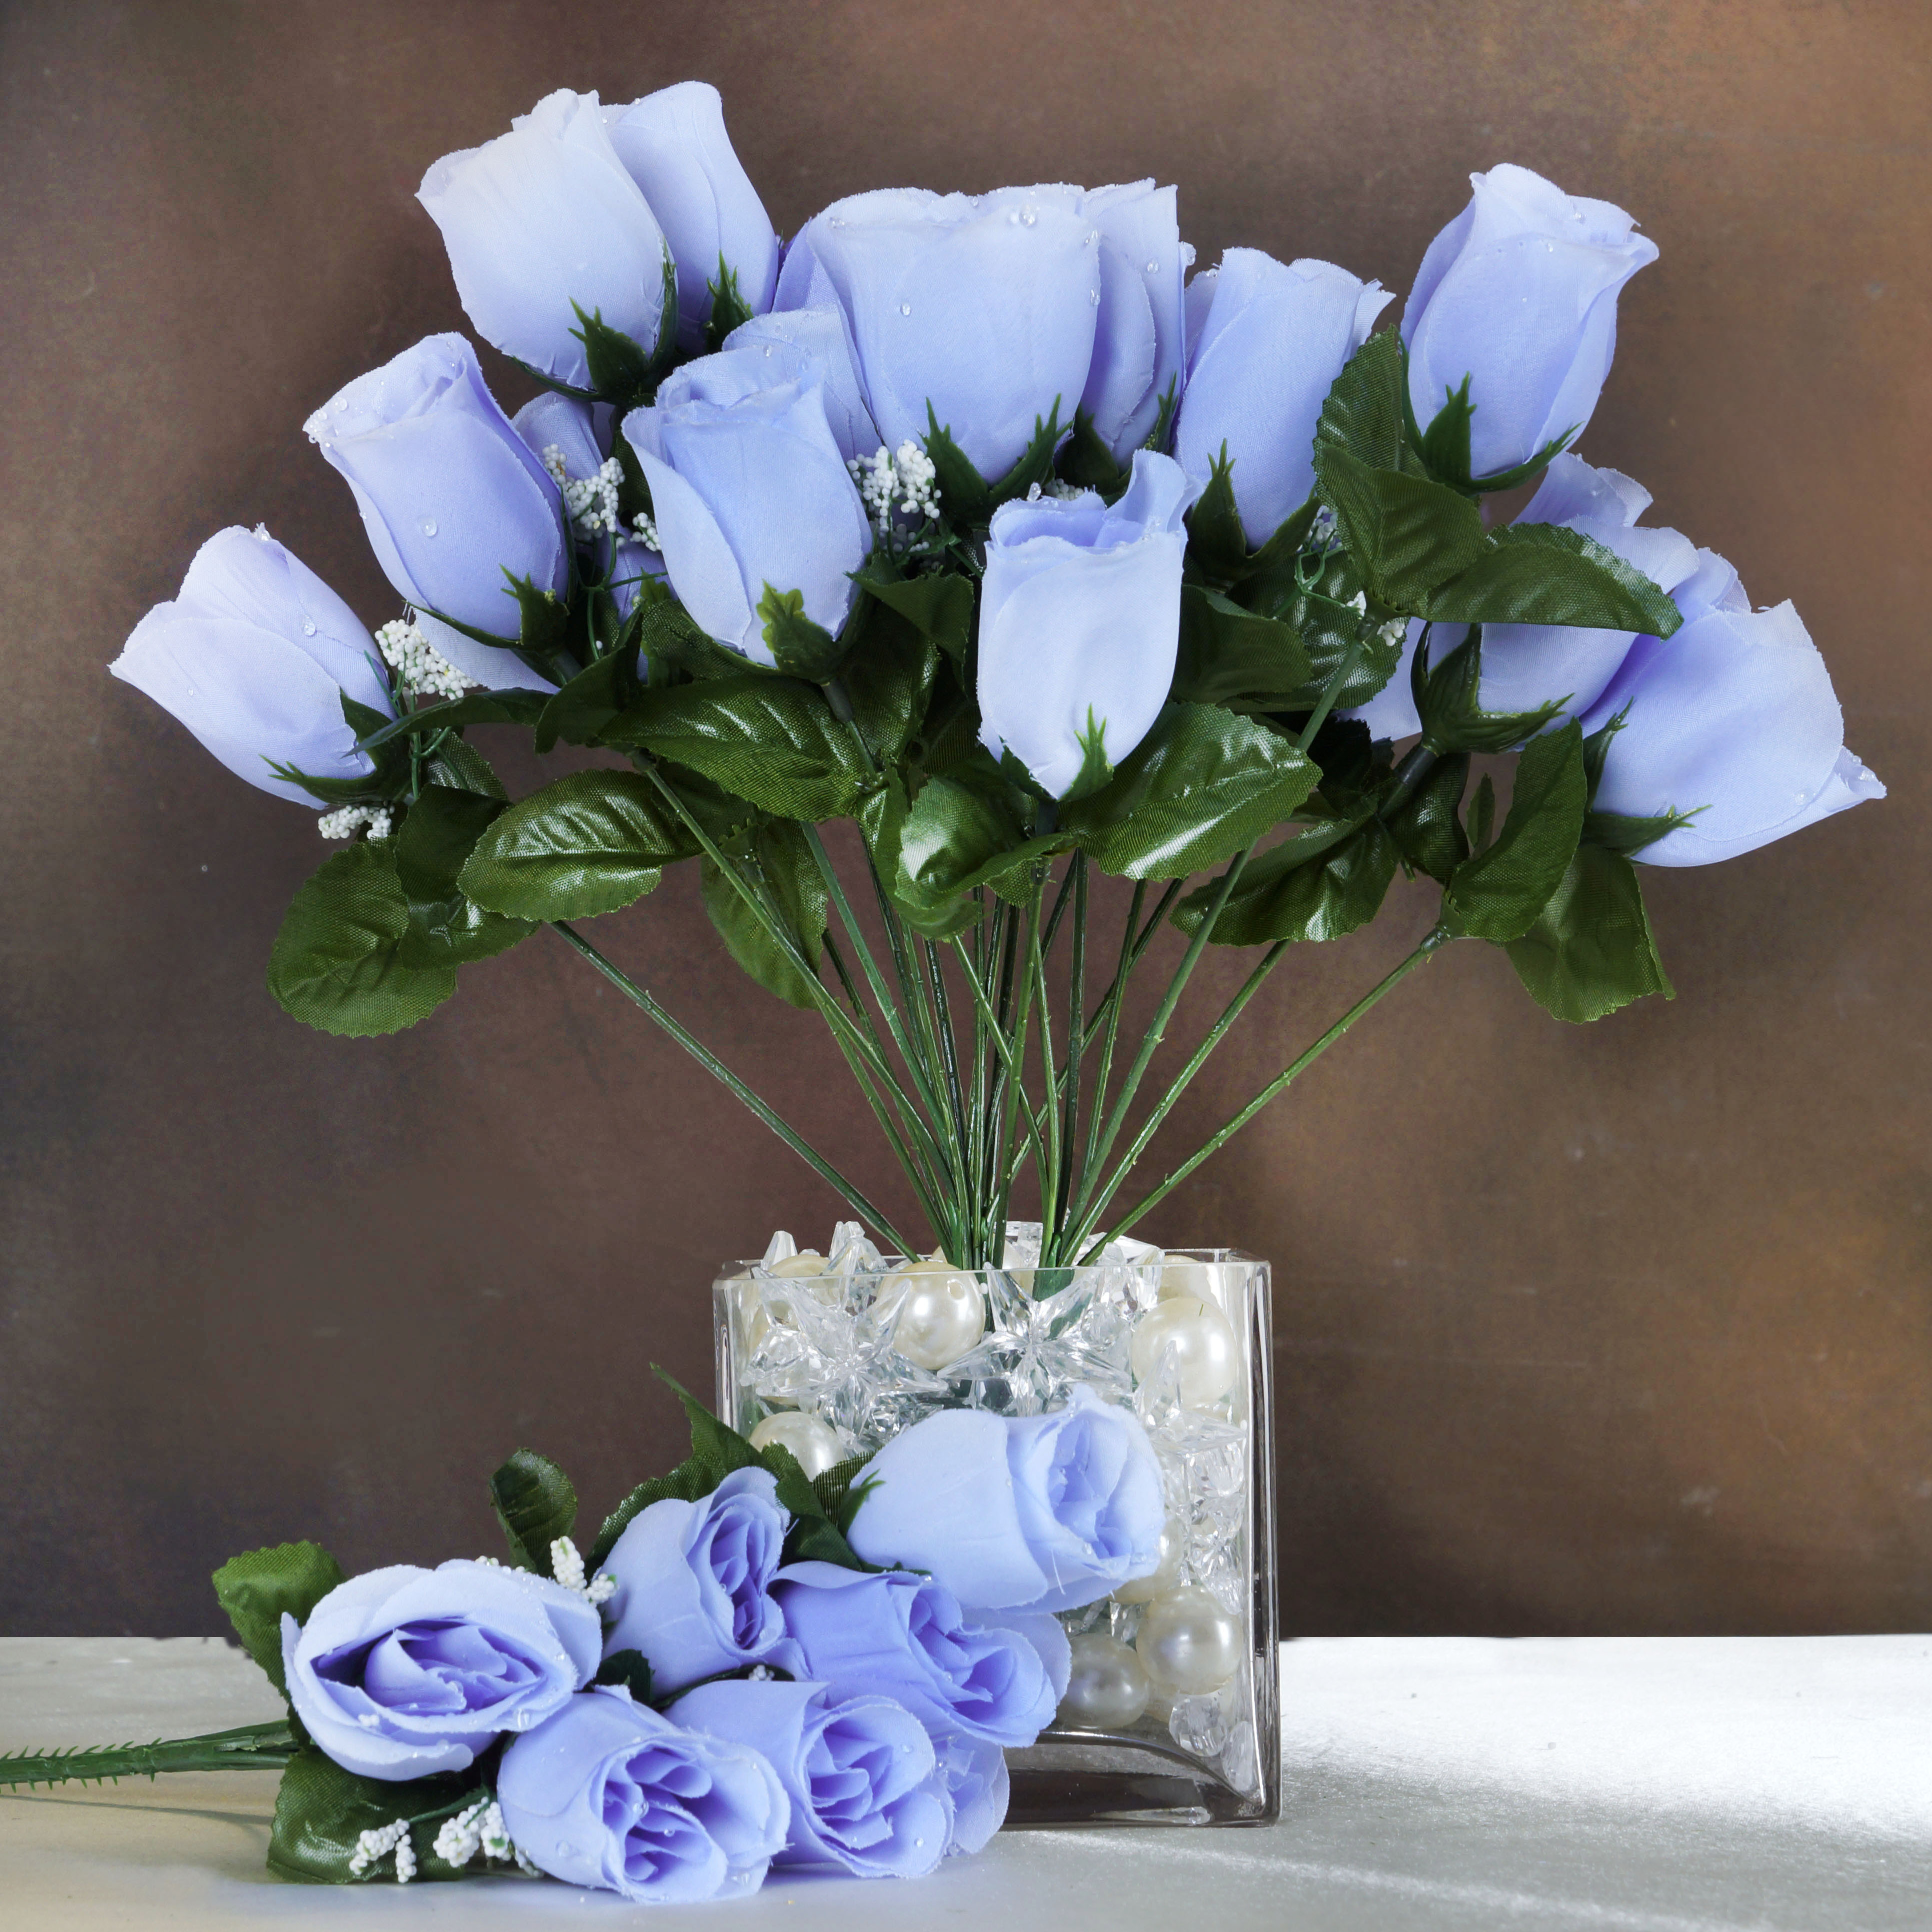 BalsaCircle 84 Silk Buds Roses Wedding Flowers Bouquets SALE